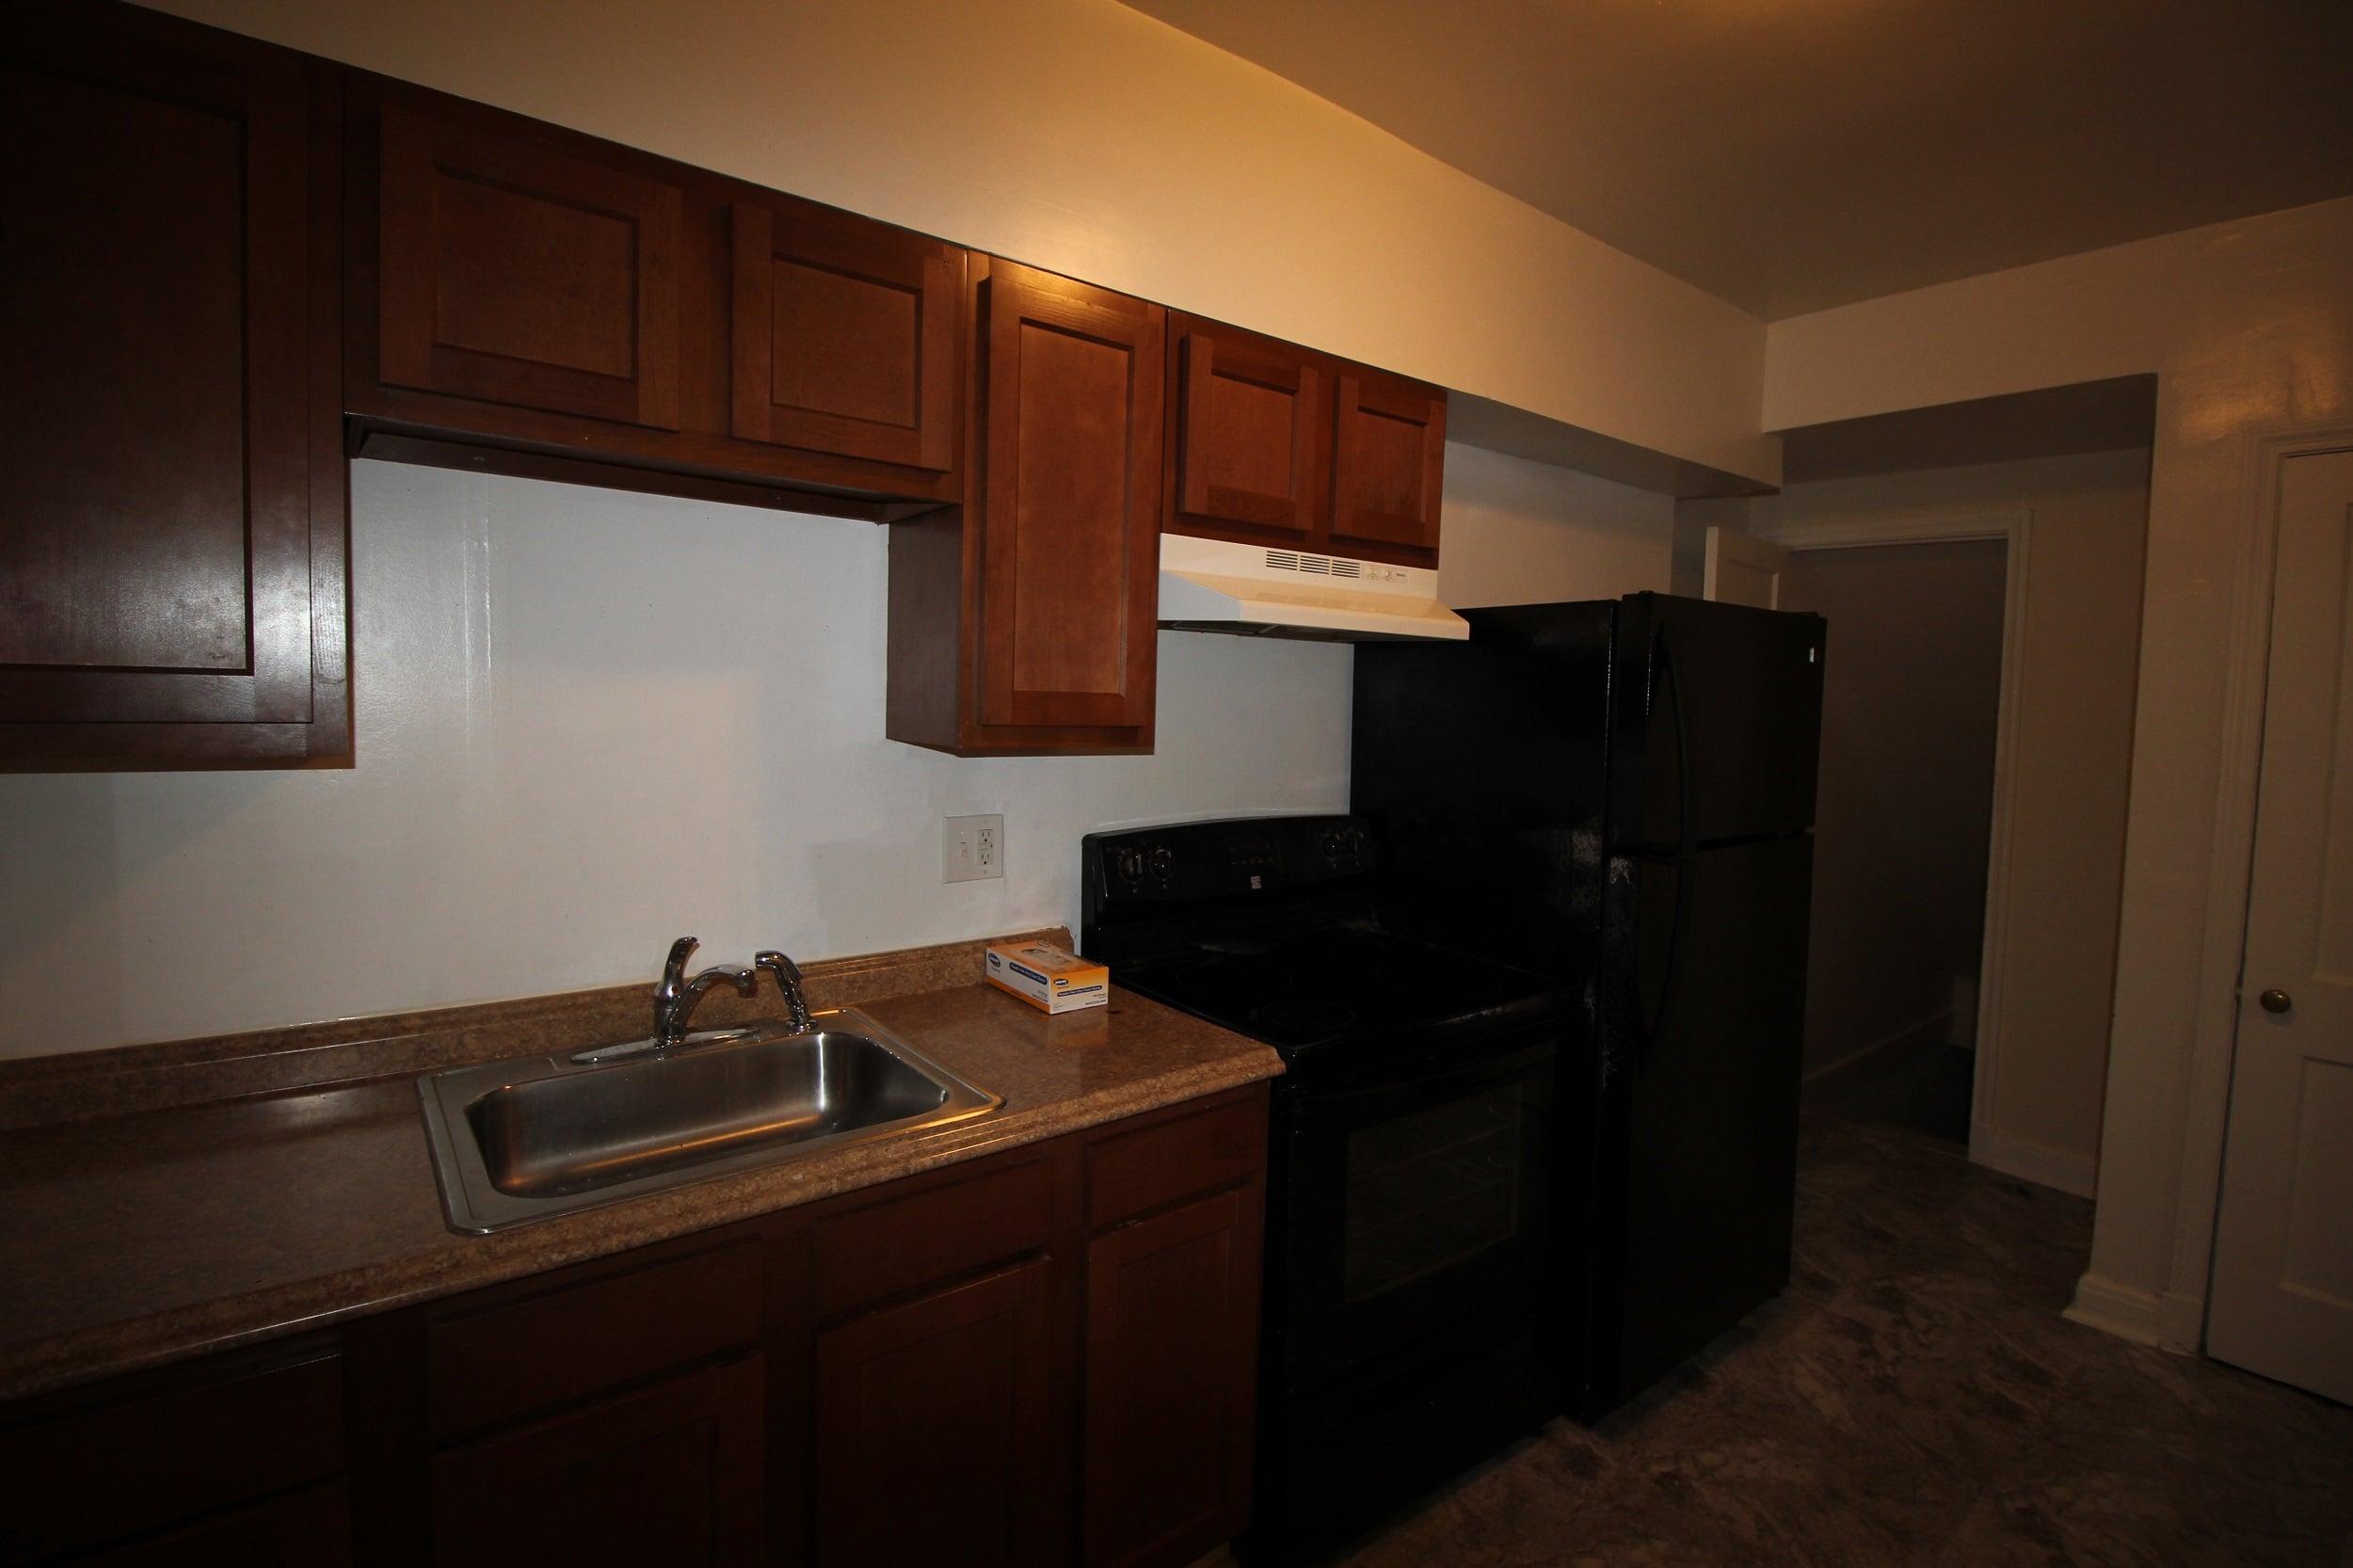 Kitchen 3834 Greenspring Ave